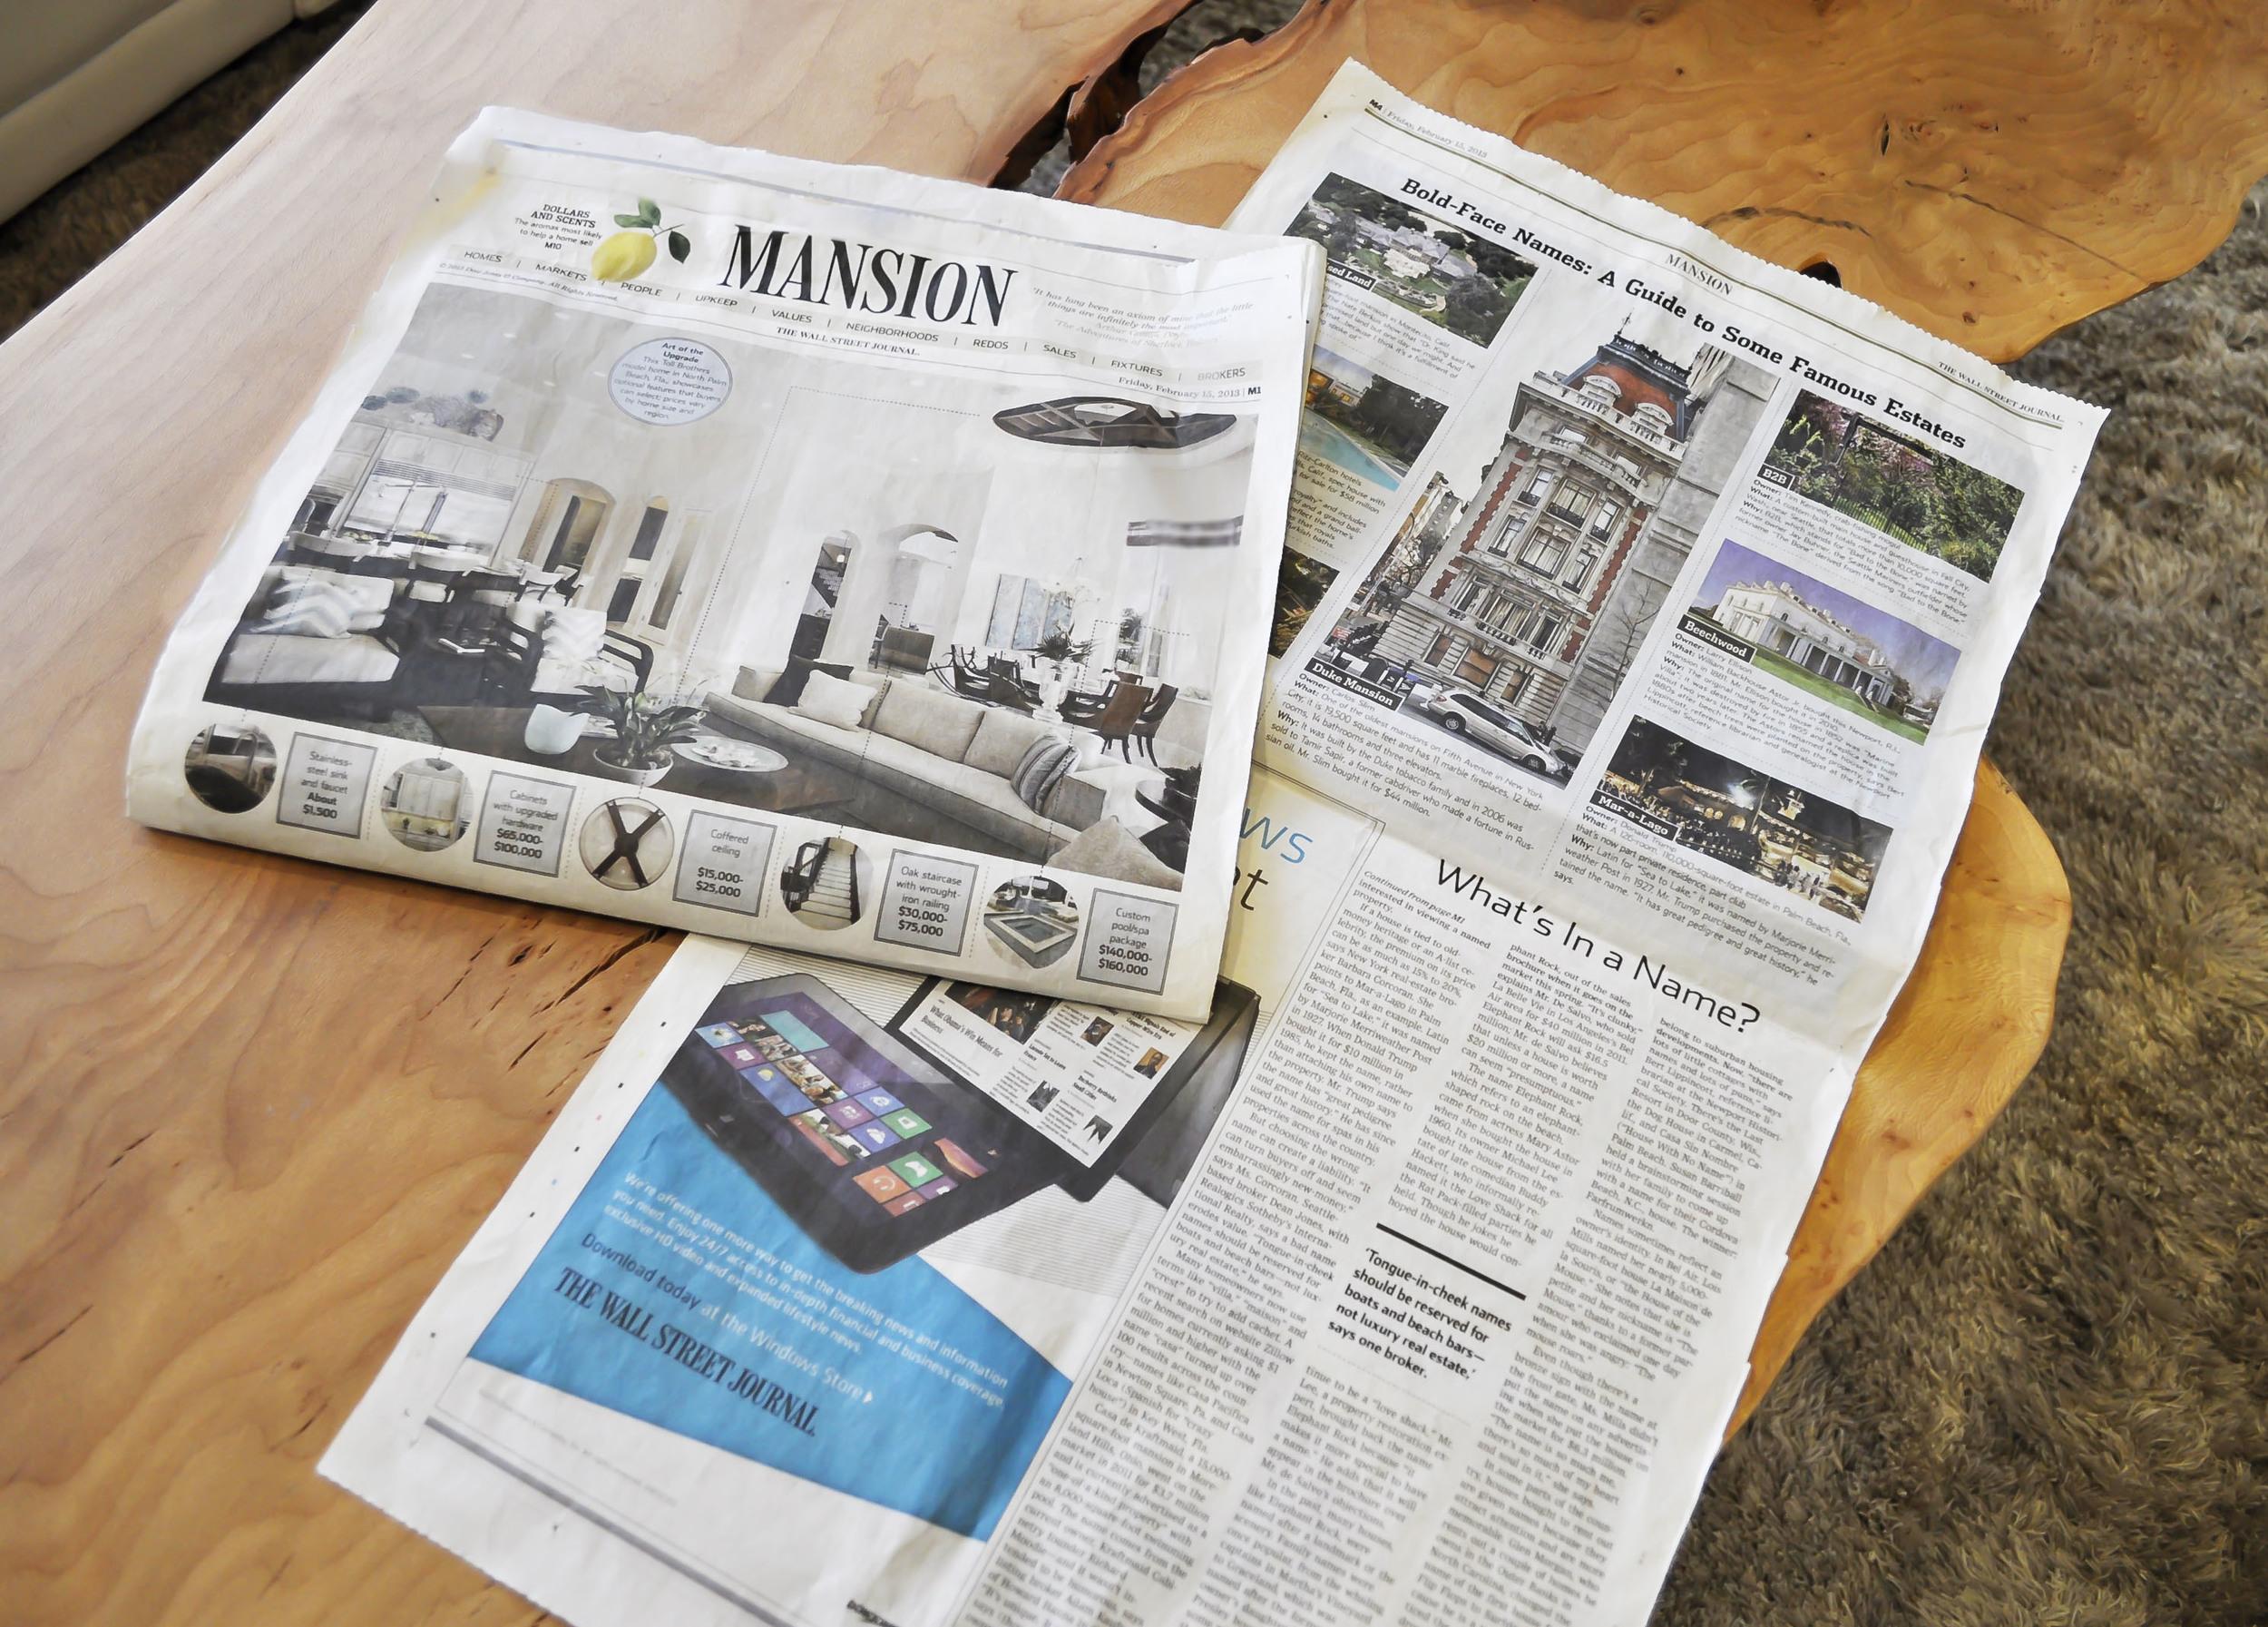 MansionMansion Blog Photo.JPG